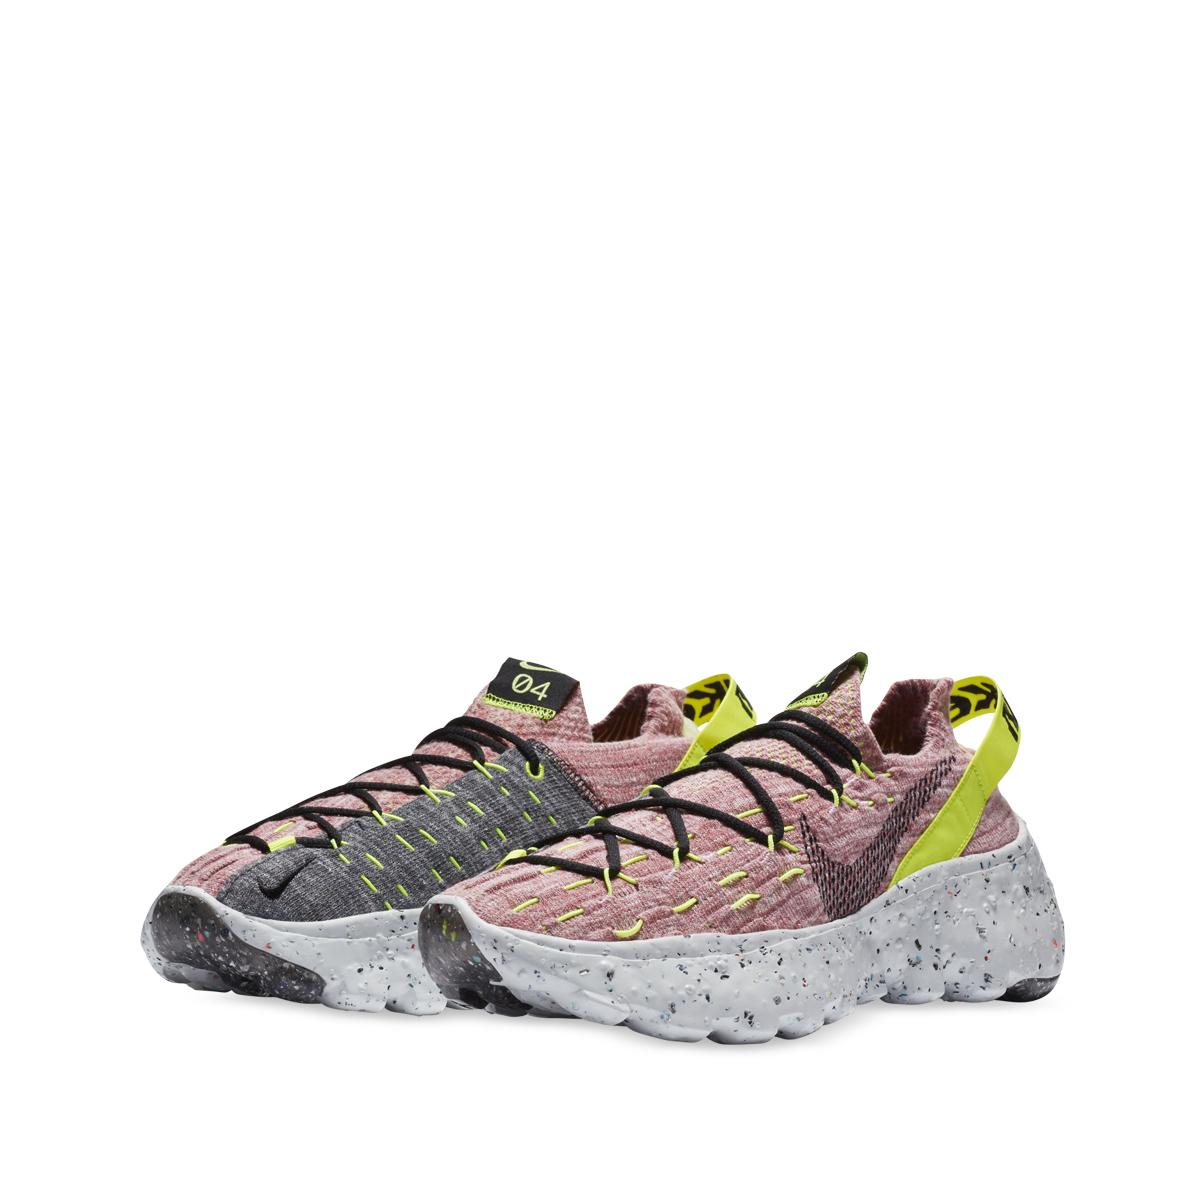 Nike Womens Space Hippie 04